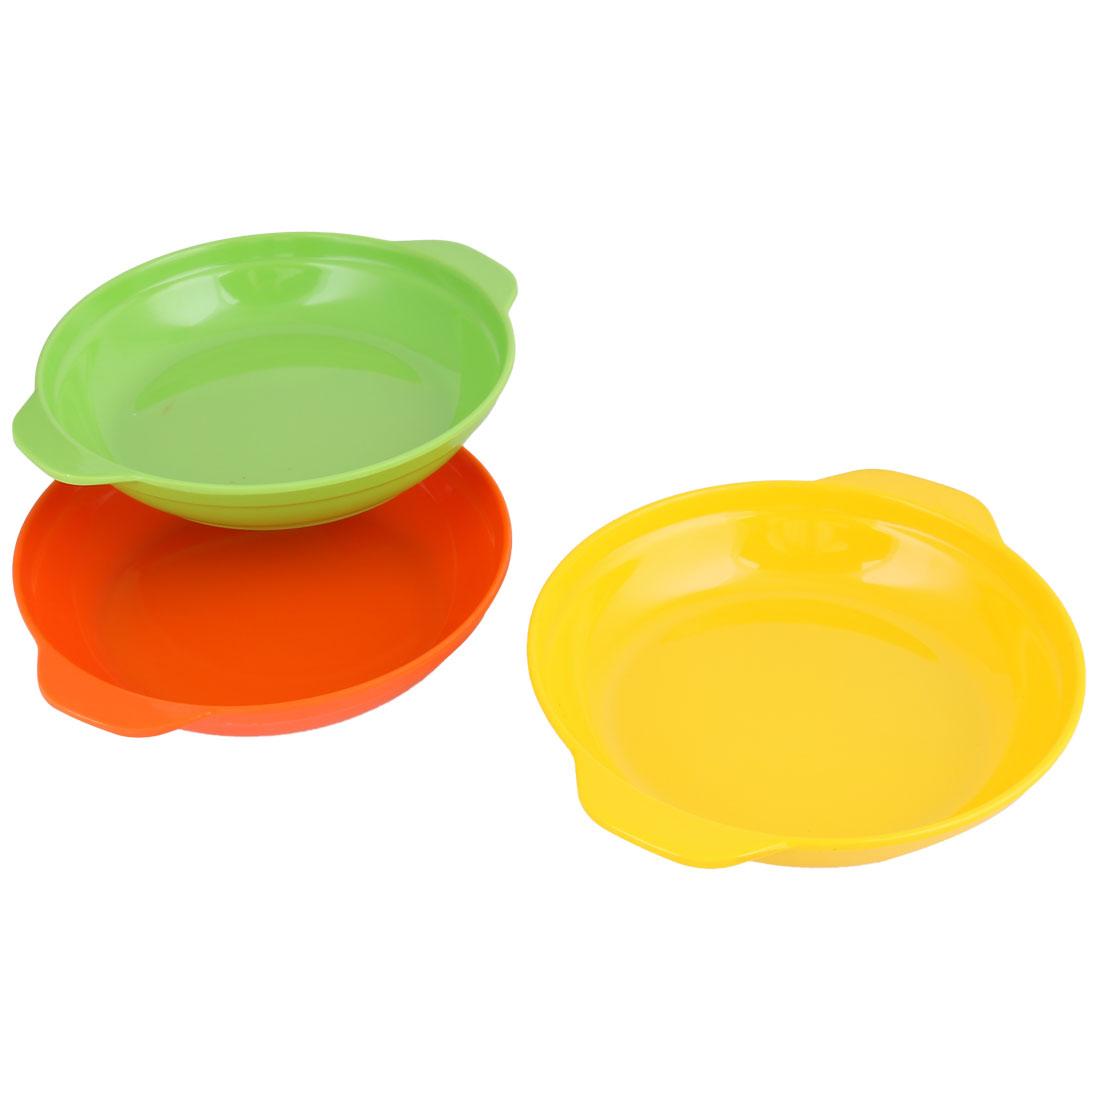 Kitchen Tableware Plastic Serving Dinner Tray Food Fruit Nuts Holder Plate 3pcs